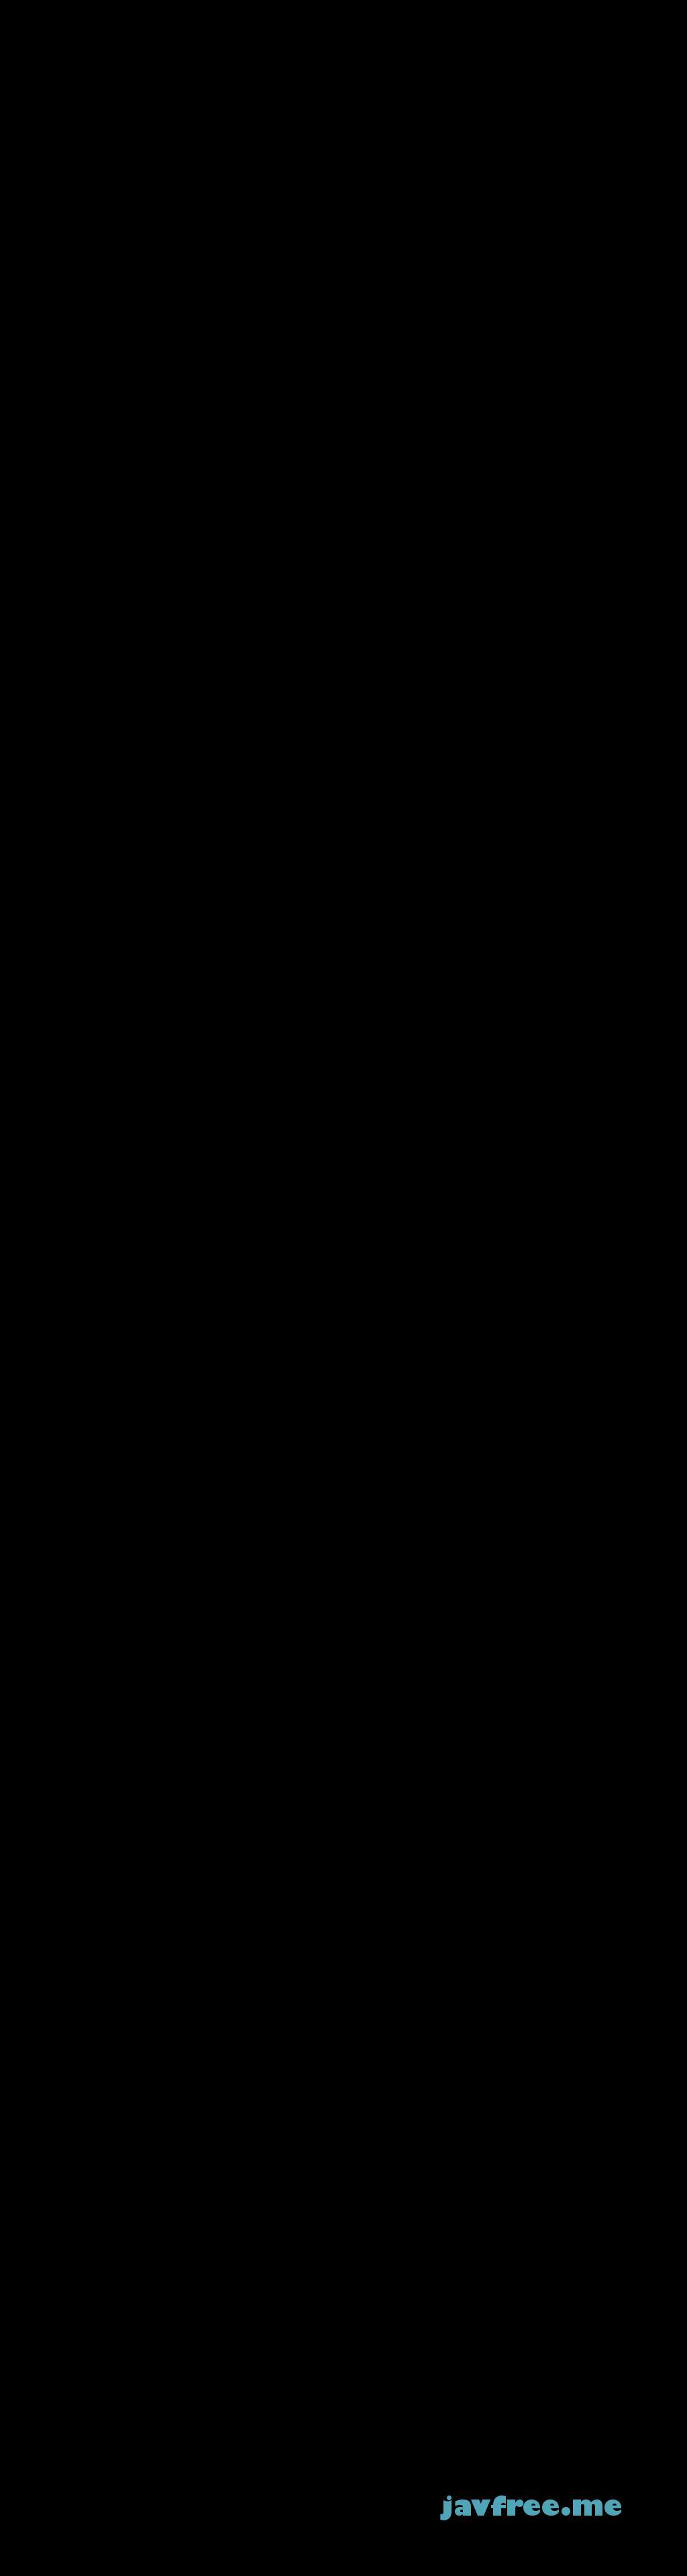 [AAJB-130] 【AV30】完全生涯保存版 永遠なる淫舞 美しき女神たち